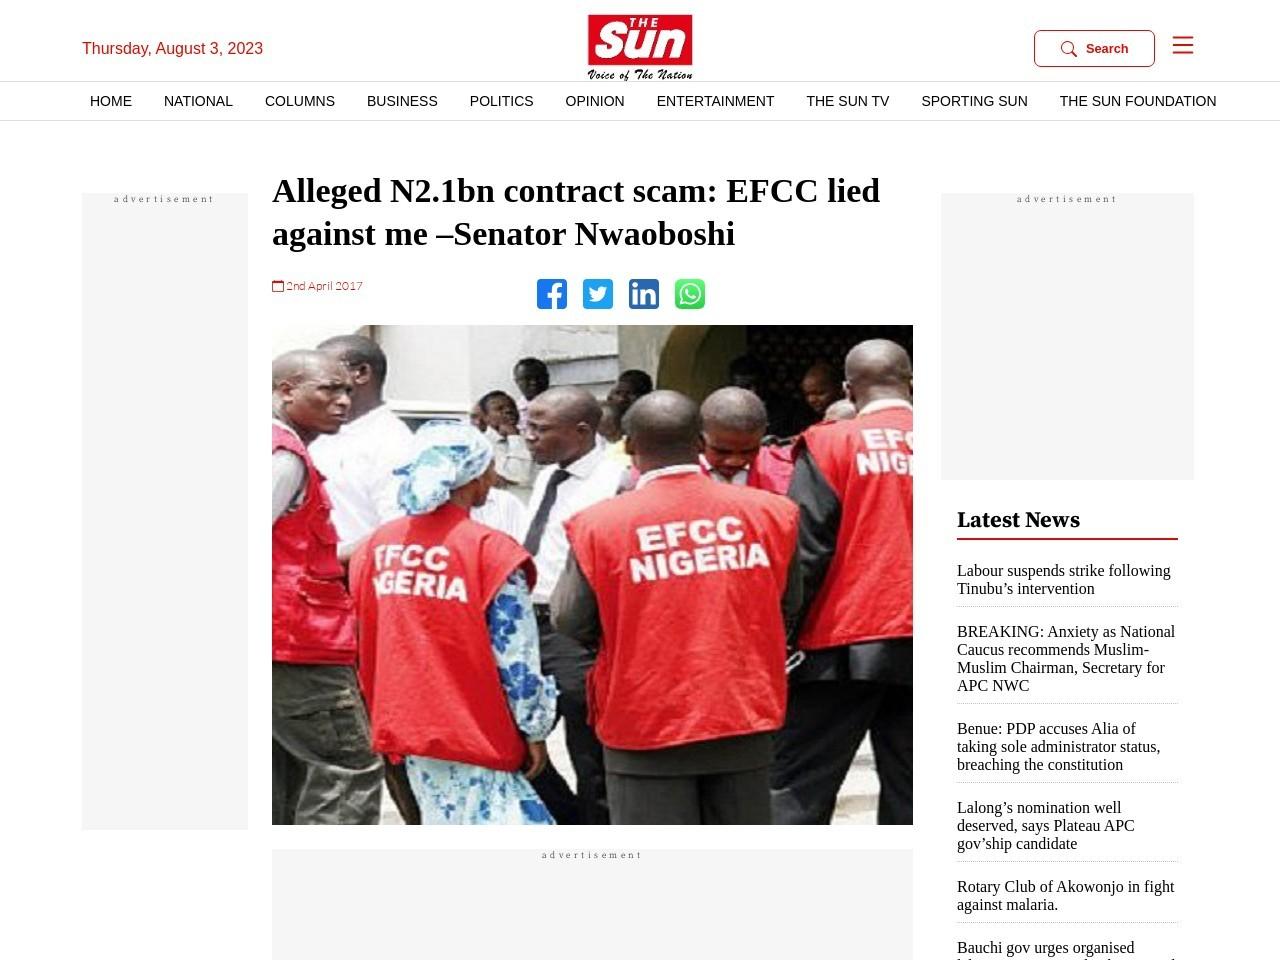 Alleged N2.1bn contract scam: EFCC lied against me –Senator Nwaoboshi